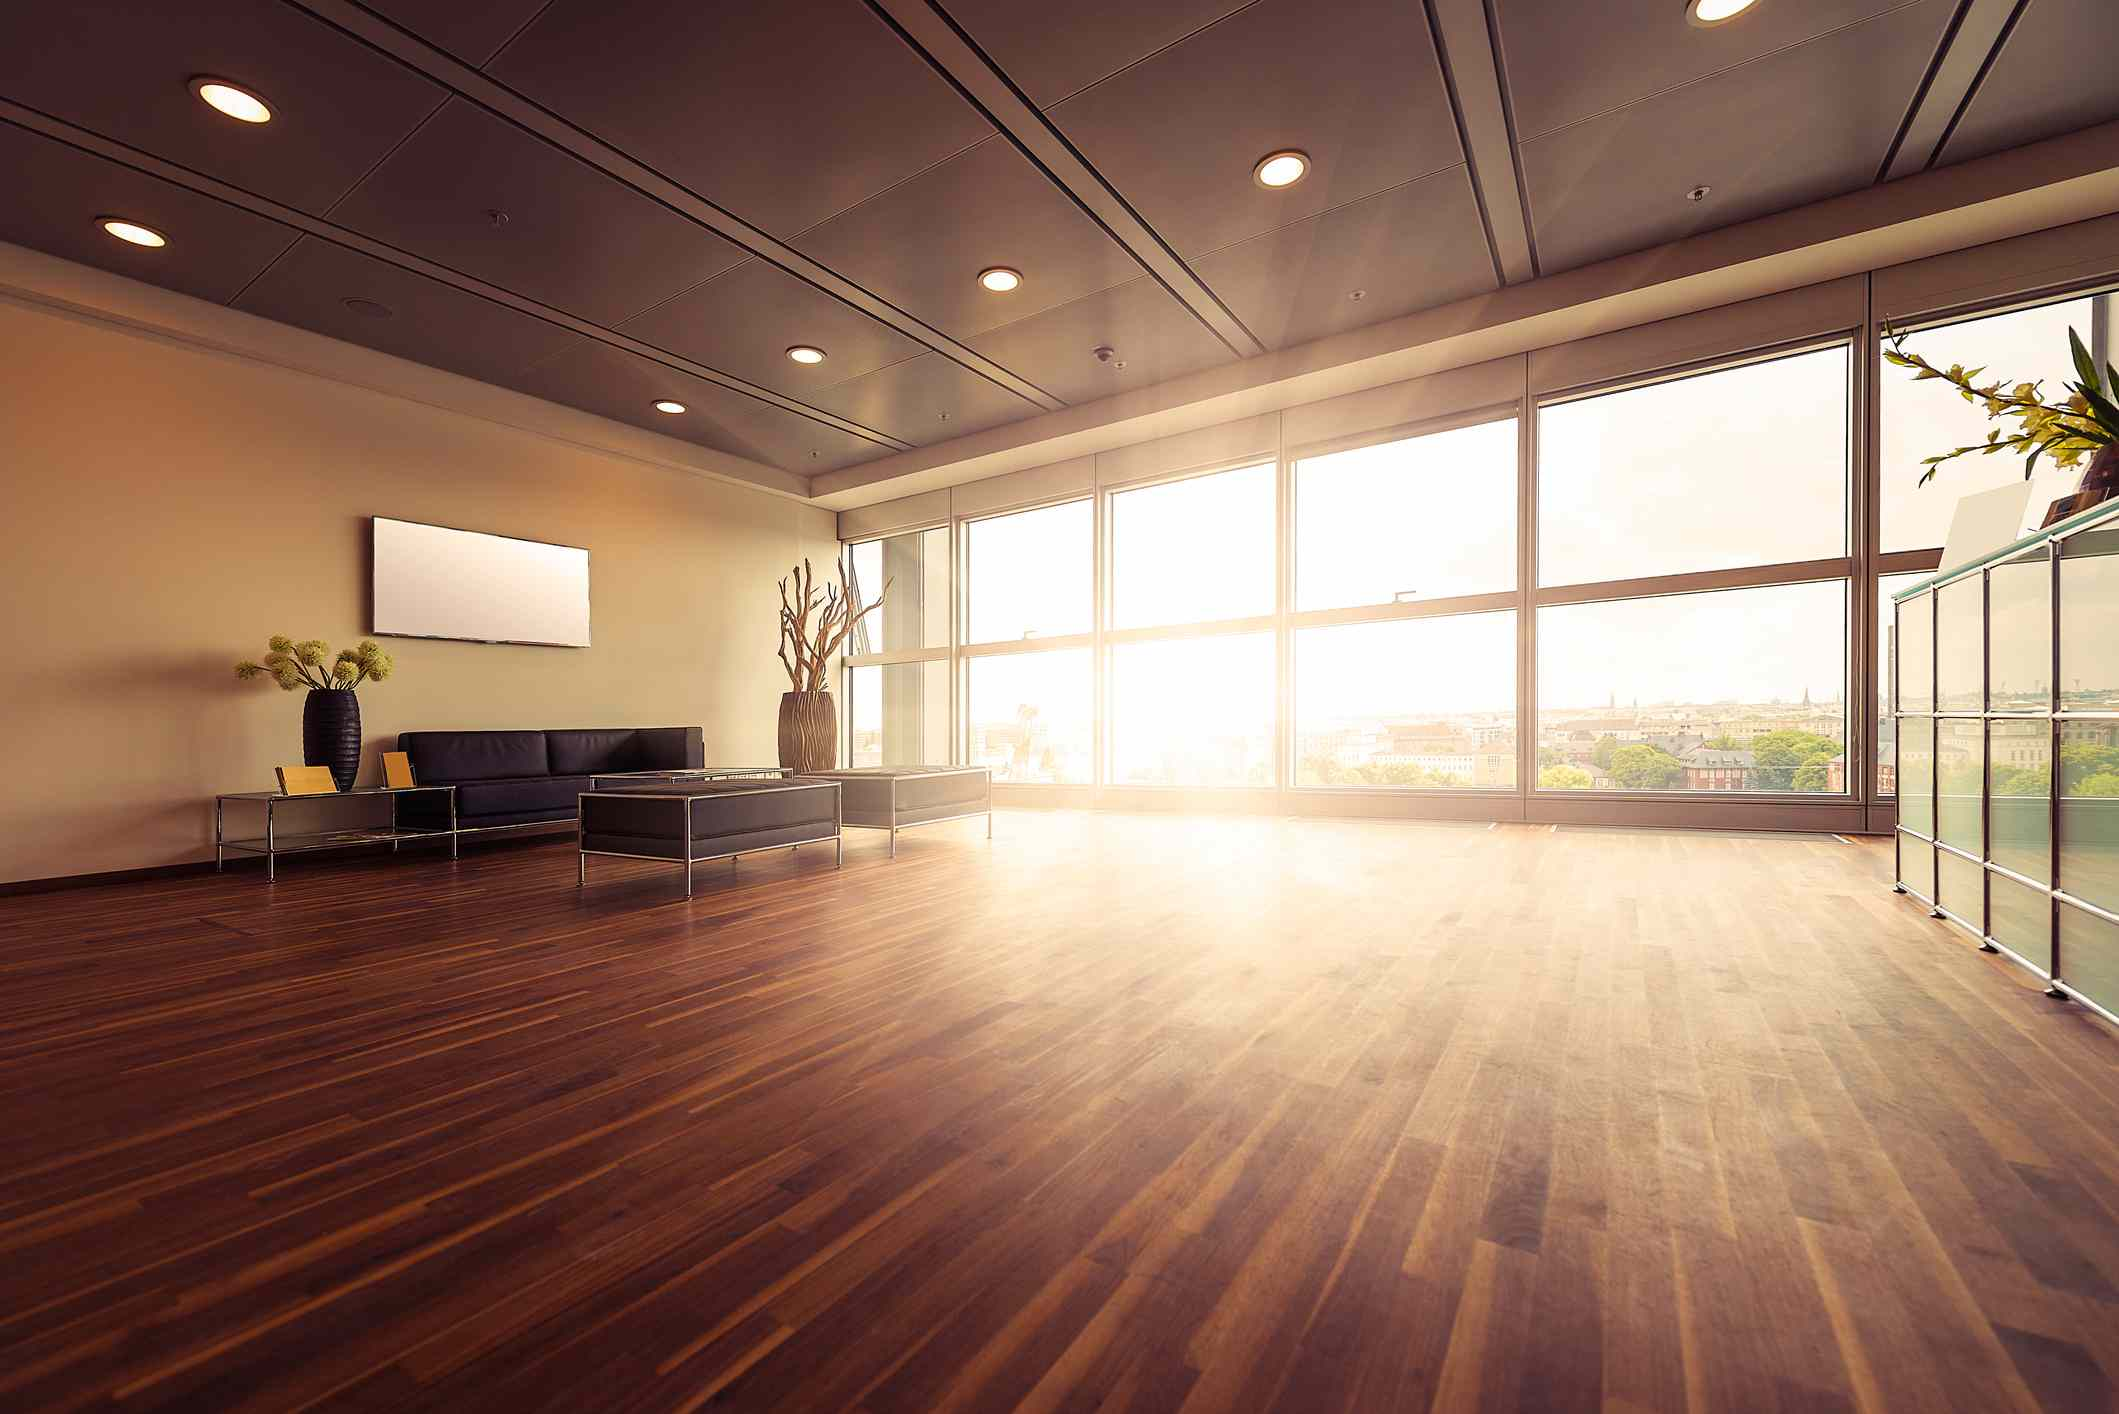 Brown Ceiling and Wood Flooring